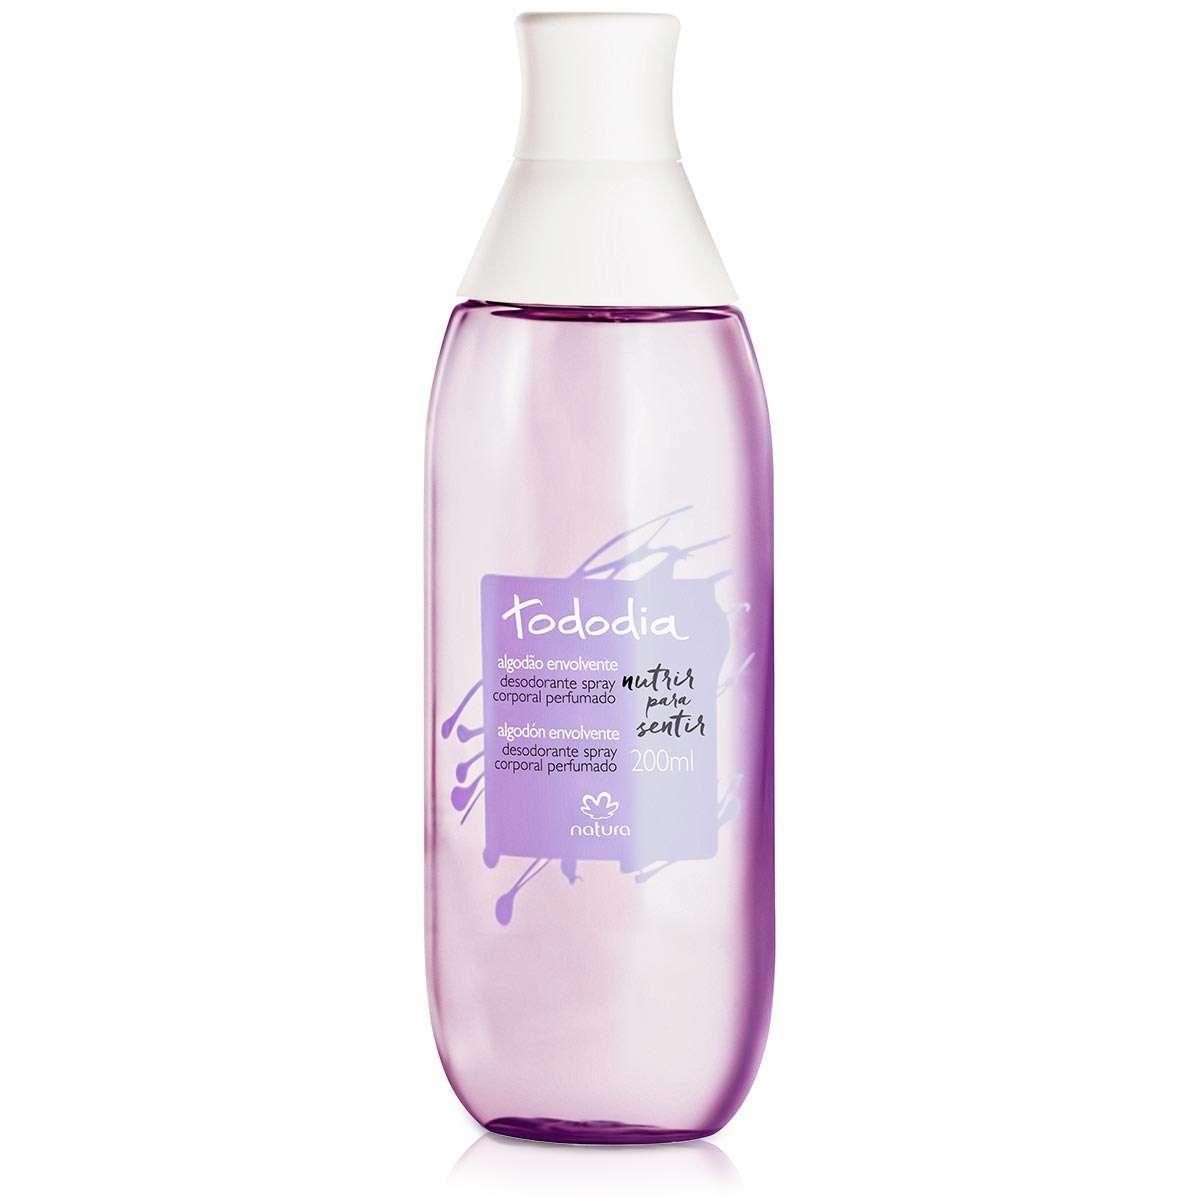 Natura Tododia Algodão Envolvente Desodorante Spray Corporal 200ml